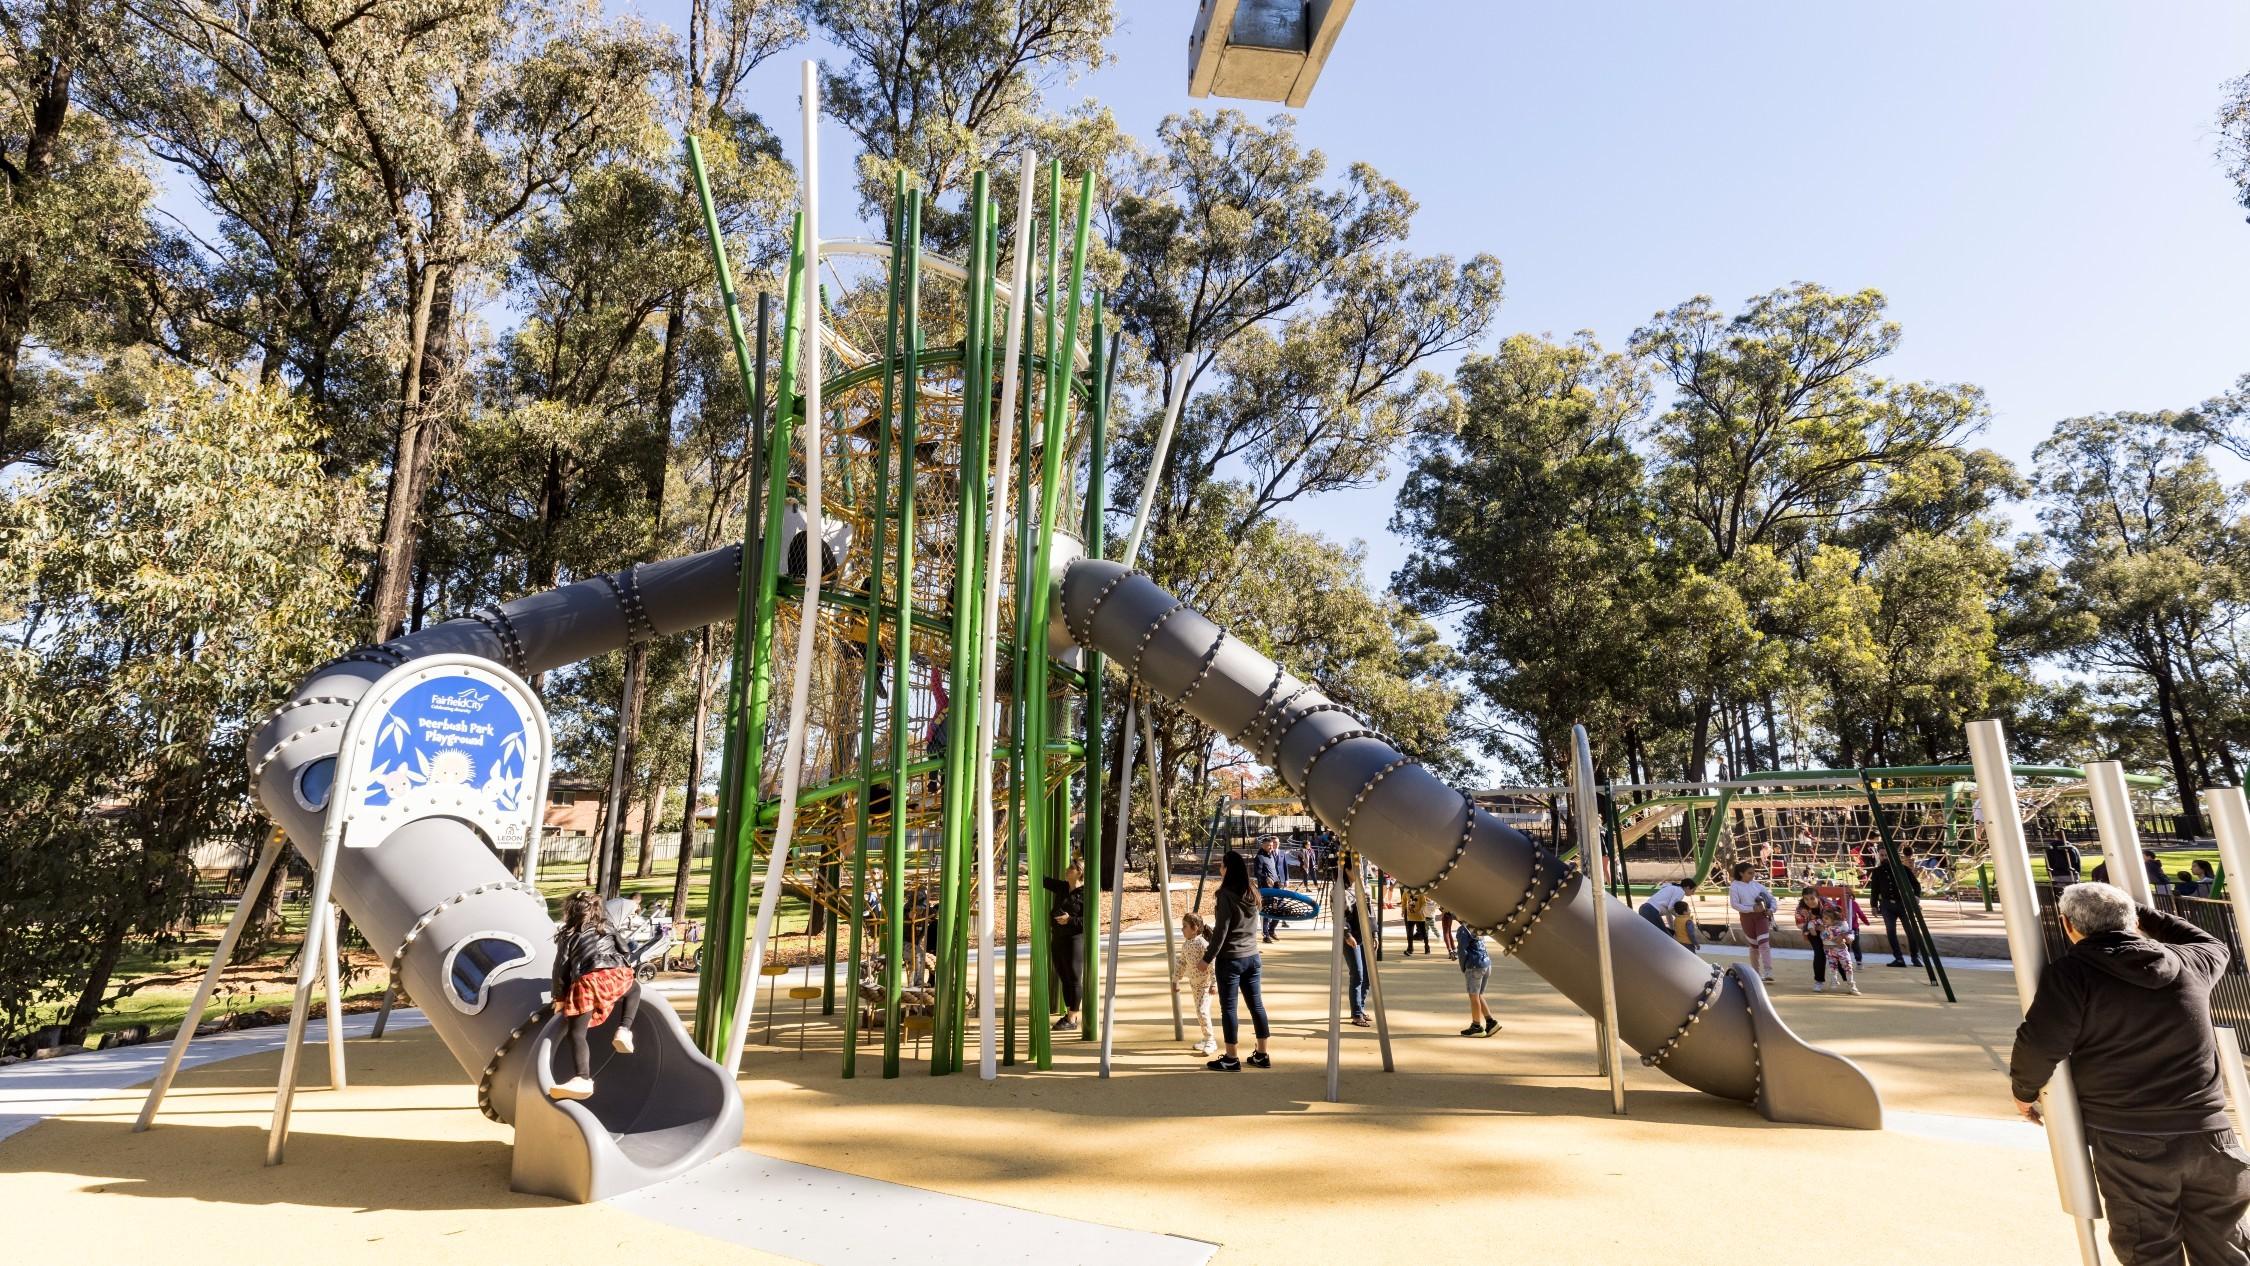 The new facilities at Deerbush Park Playground